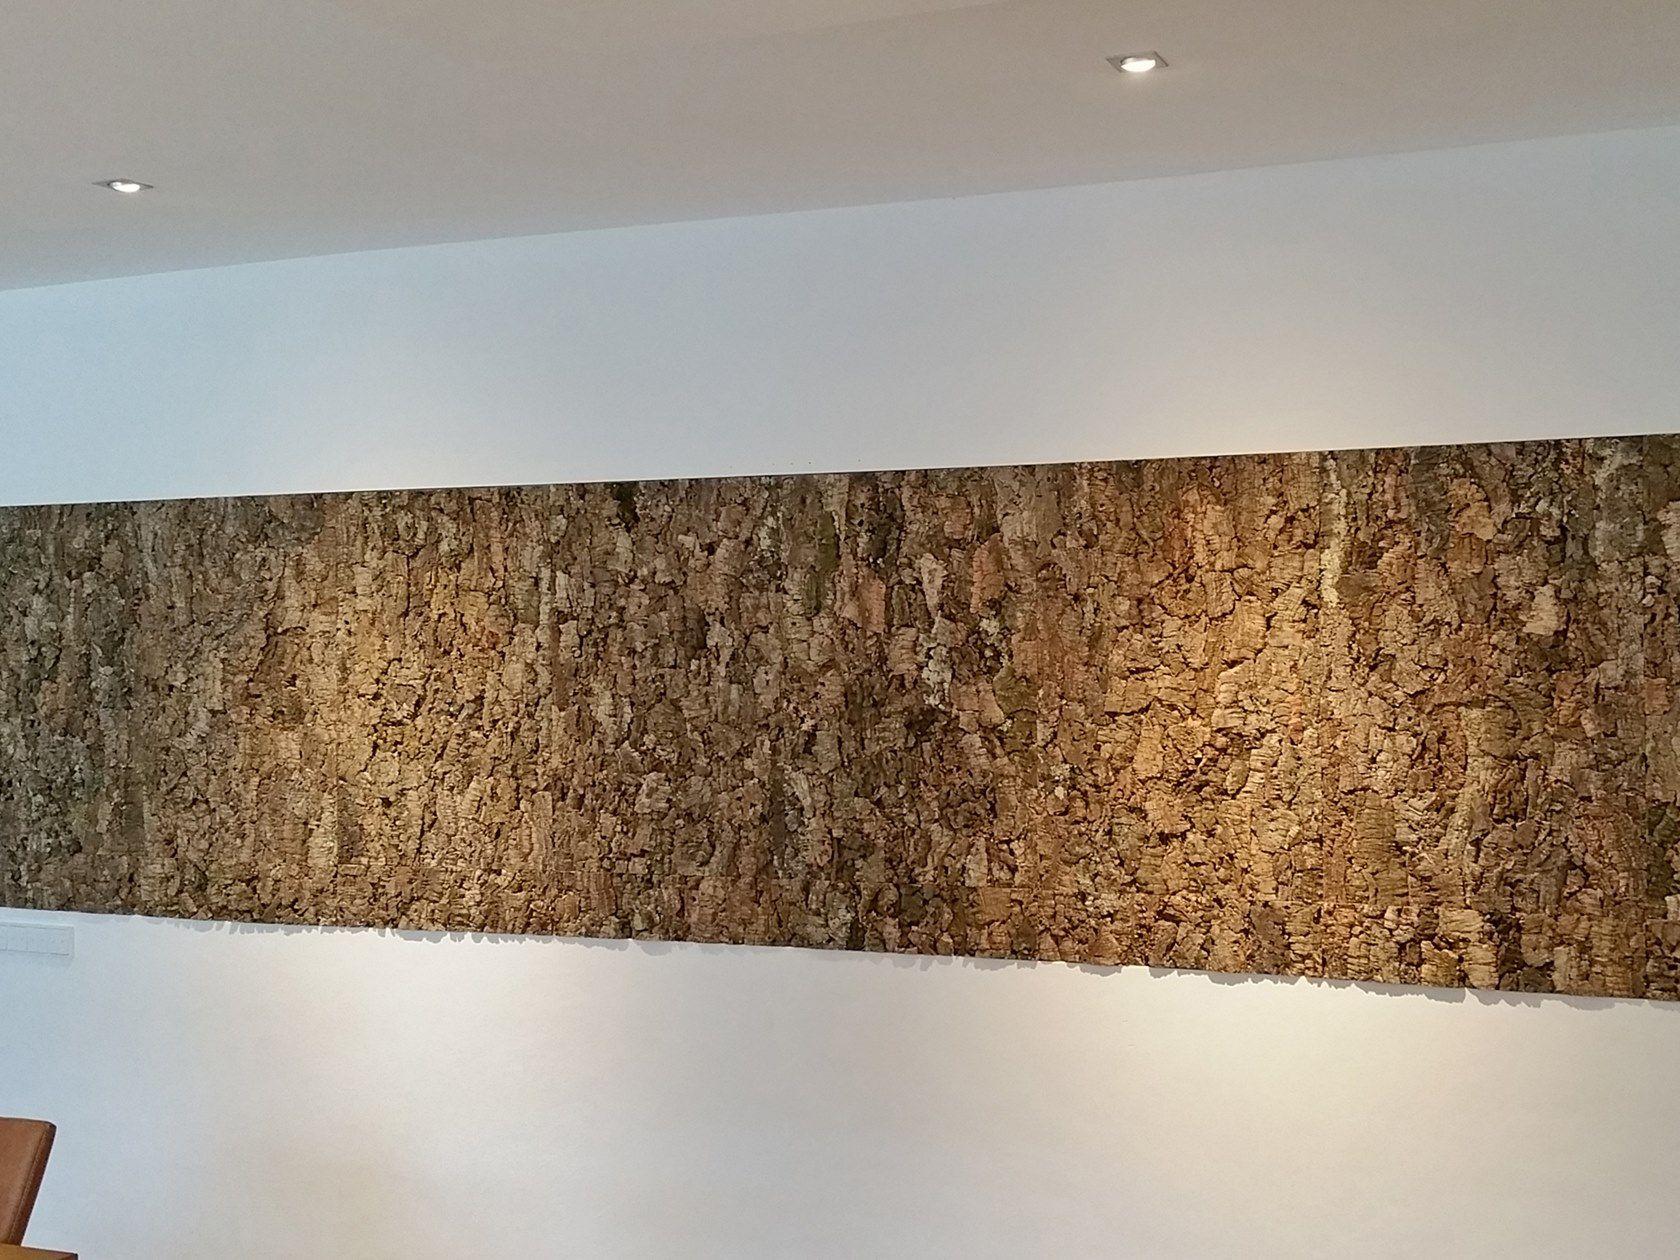 Cork Tree Bark Wall Tiles Cork Bark Wall Panels By Freund Gmbh In 2020 Wall Panels Wall Tiles Paneling